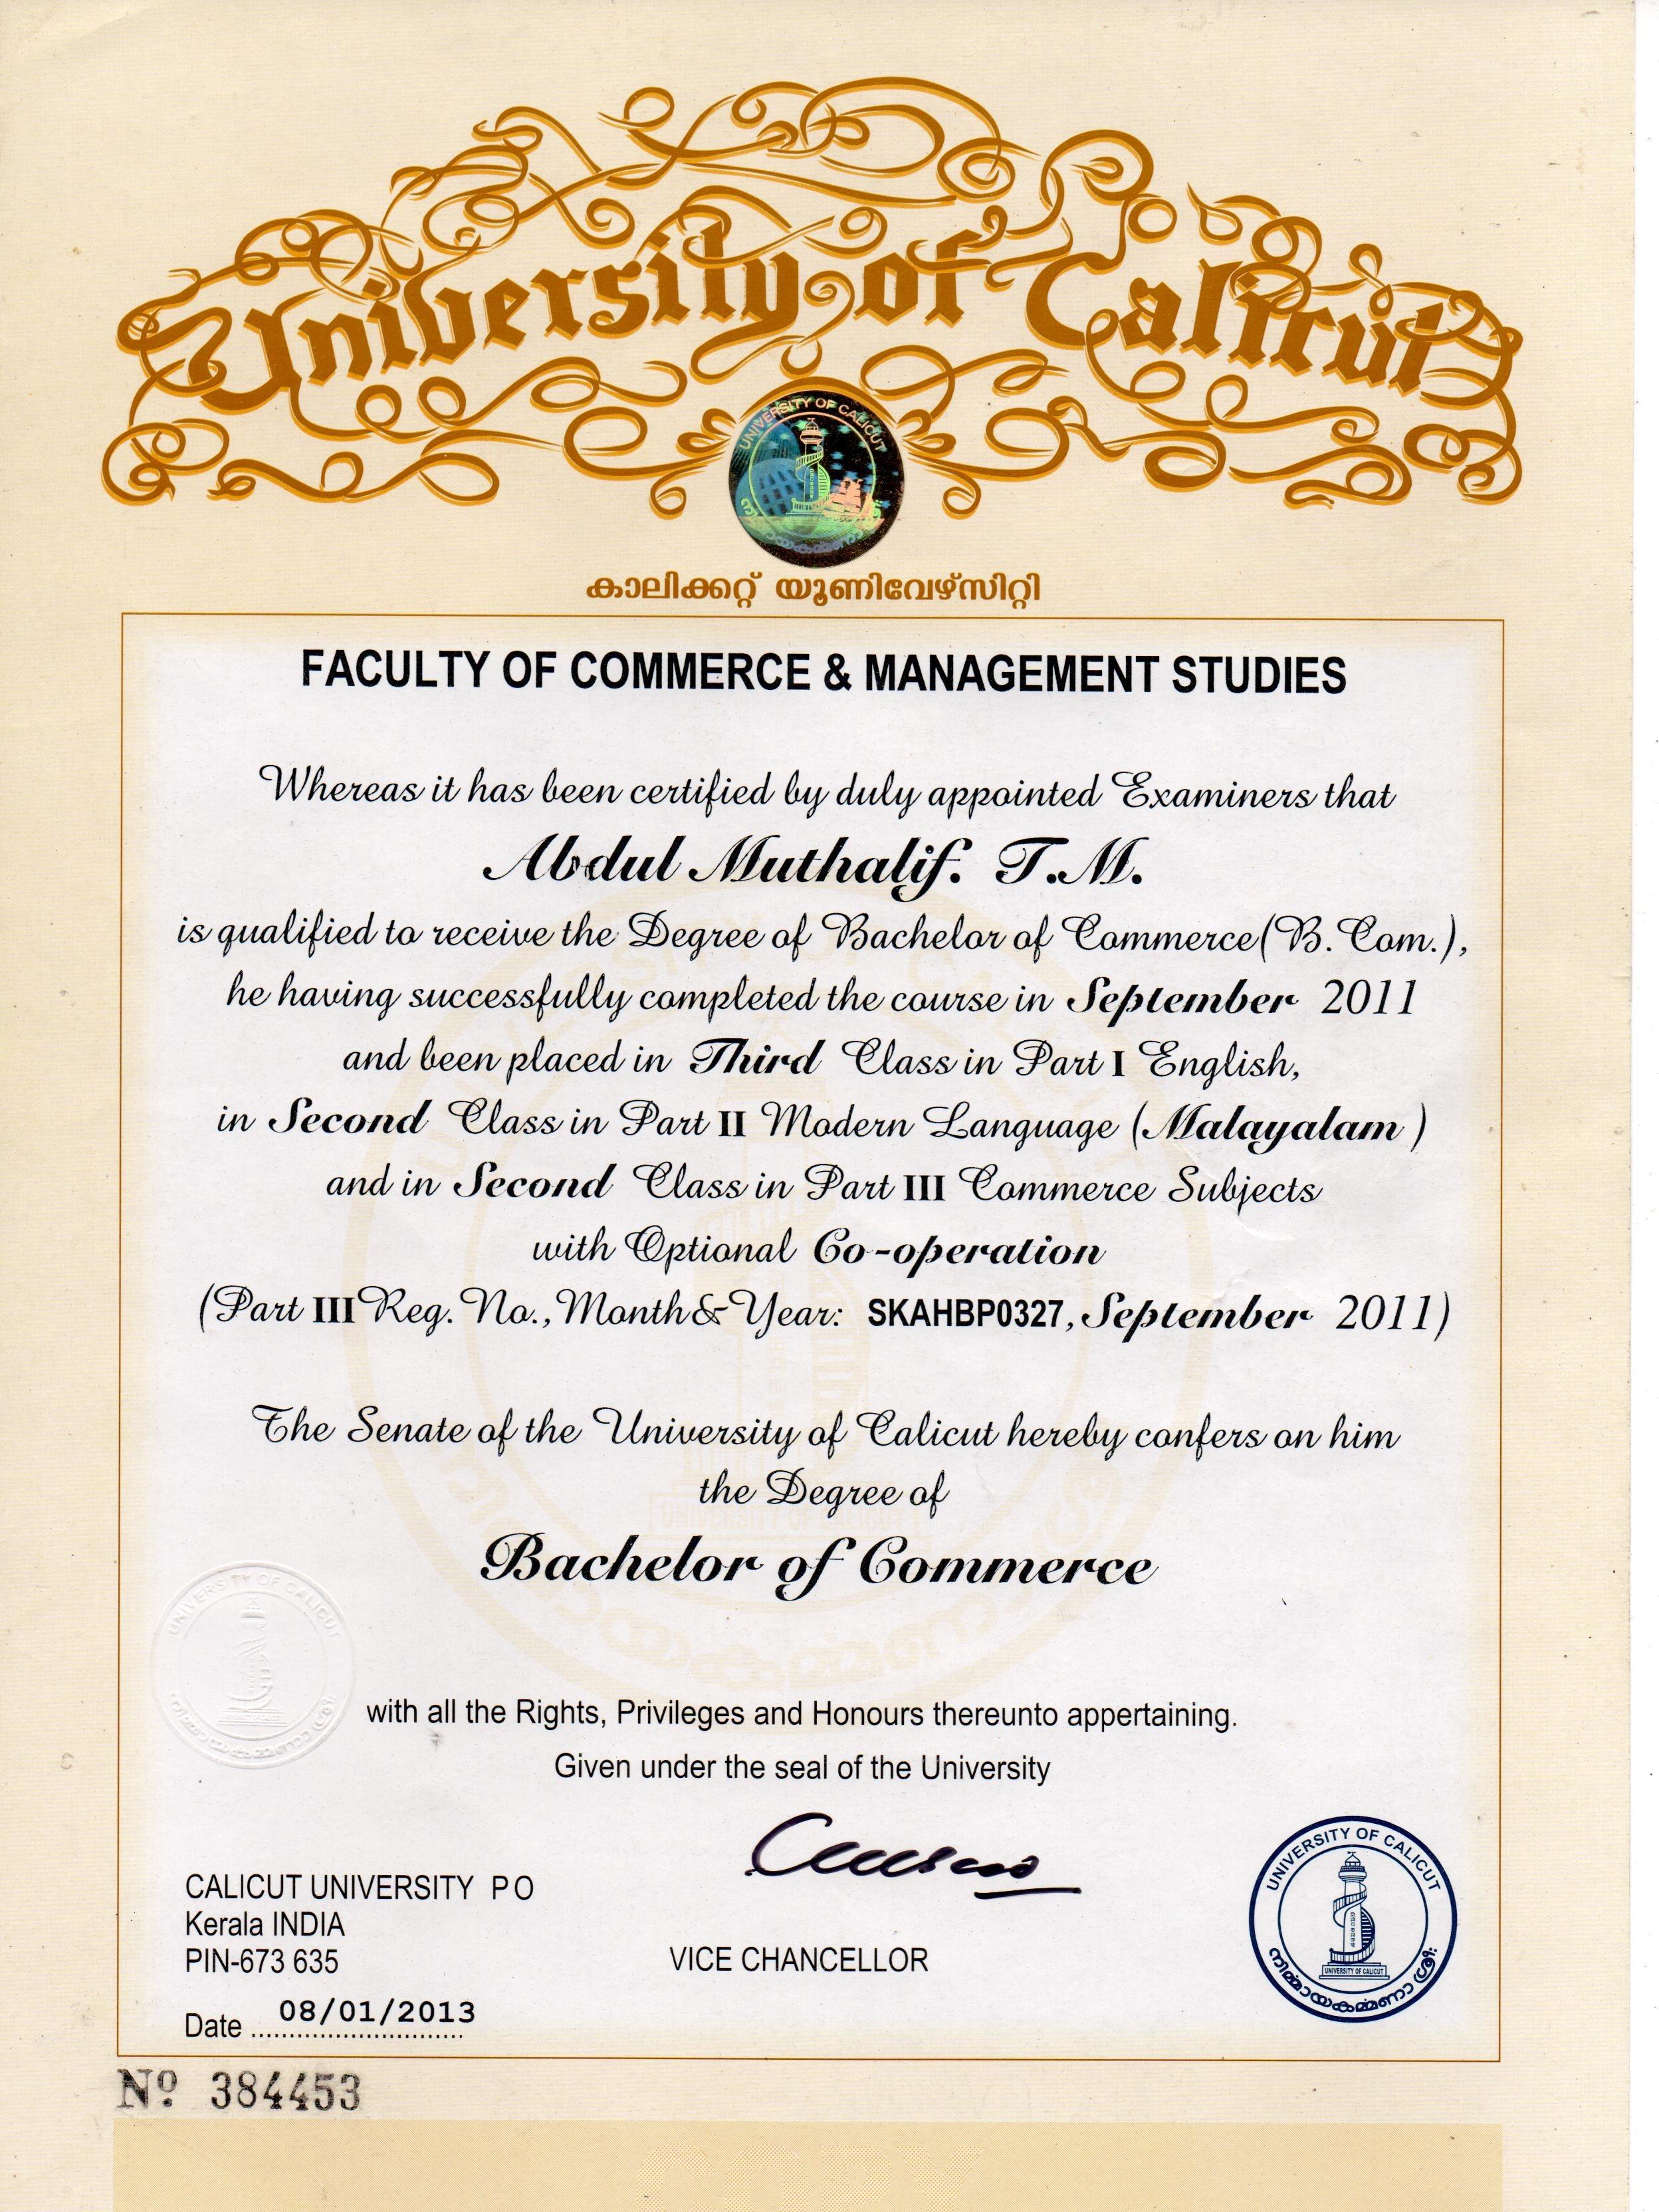 abdul muthalif t m bayt com at calicut university